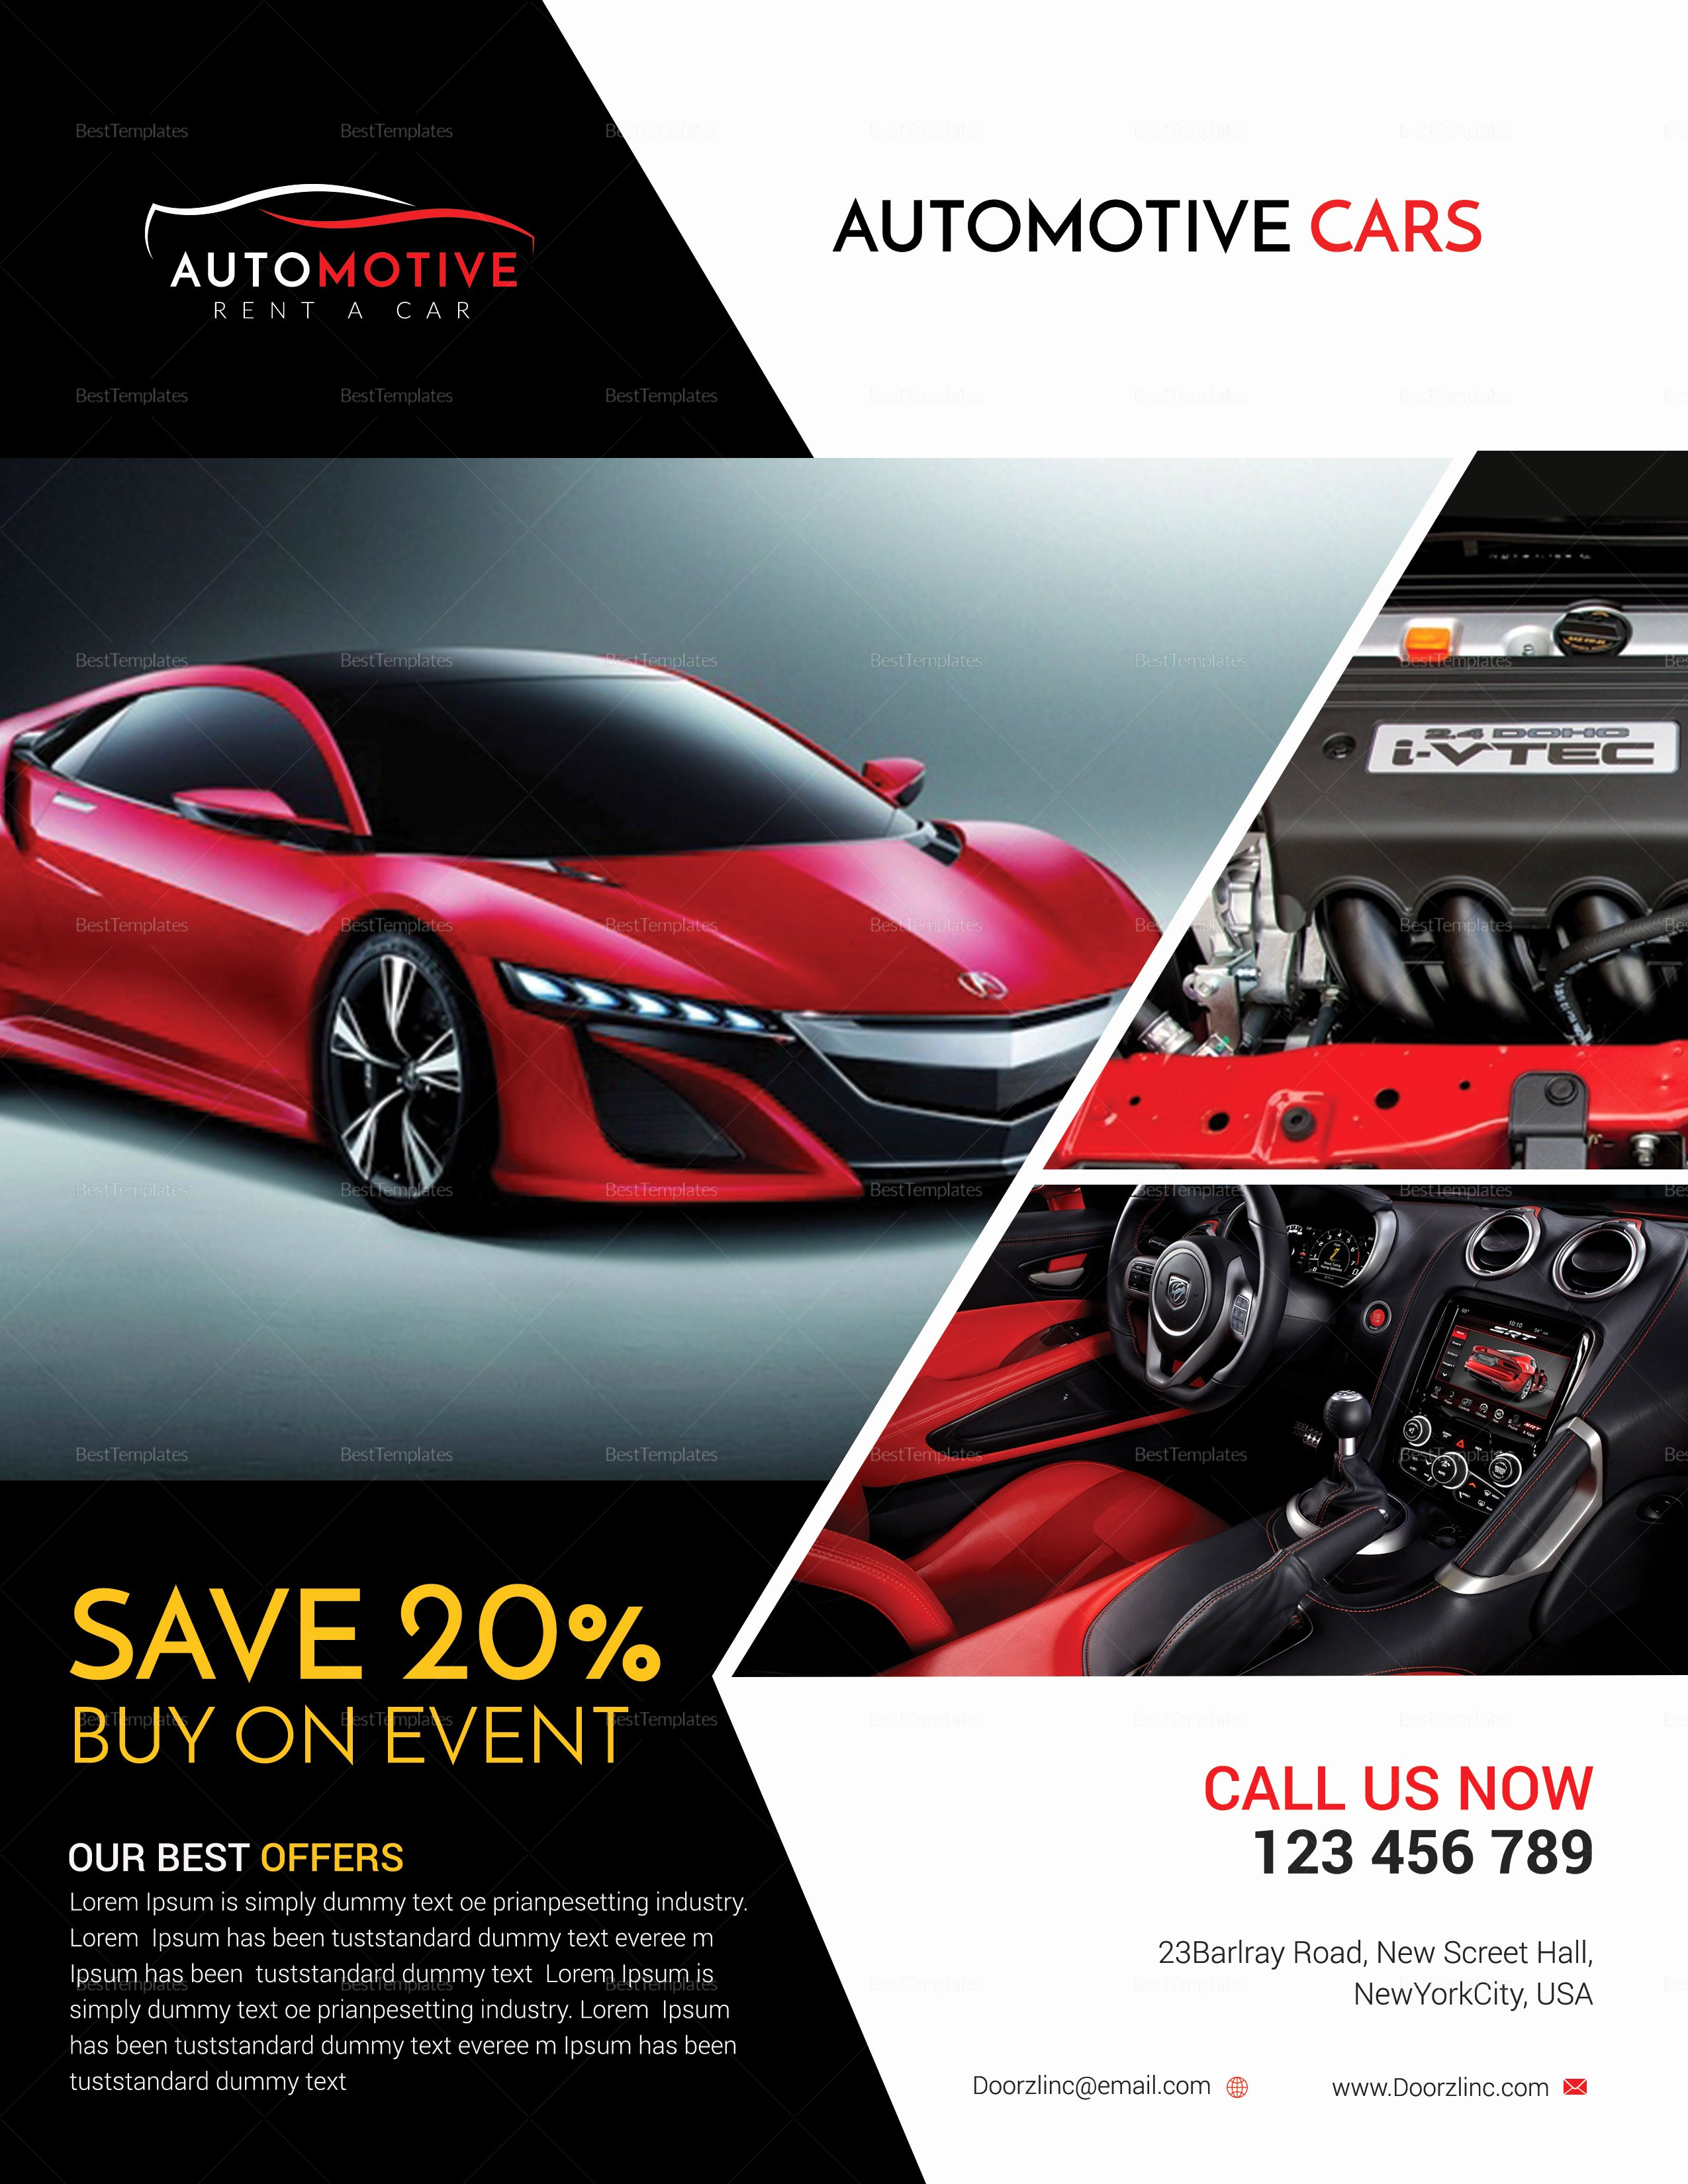 Car for Sale Flyer Template Elegant Automotive Car Sales Flyer Design Template In Psd